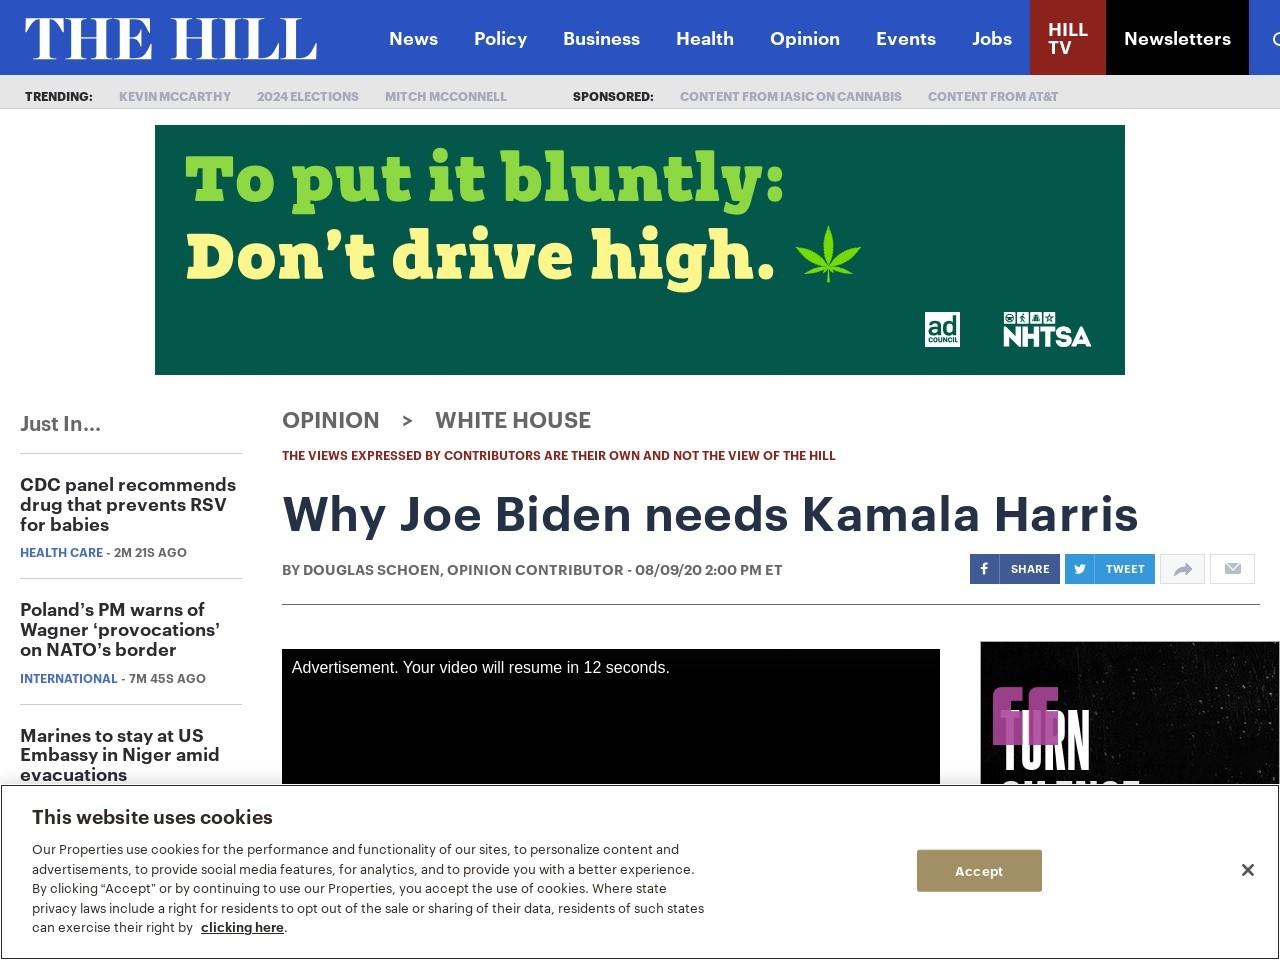 Why Joe Biden needs Kamala Harris